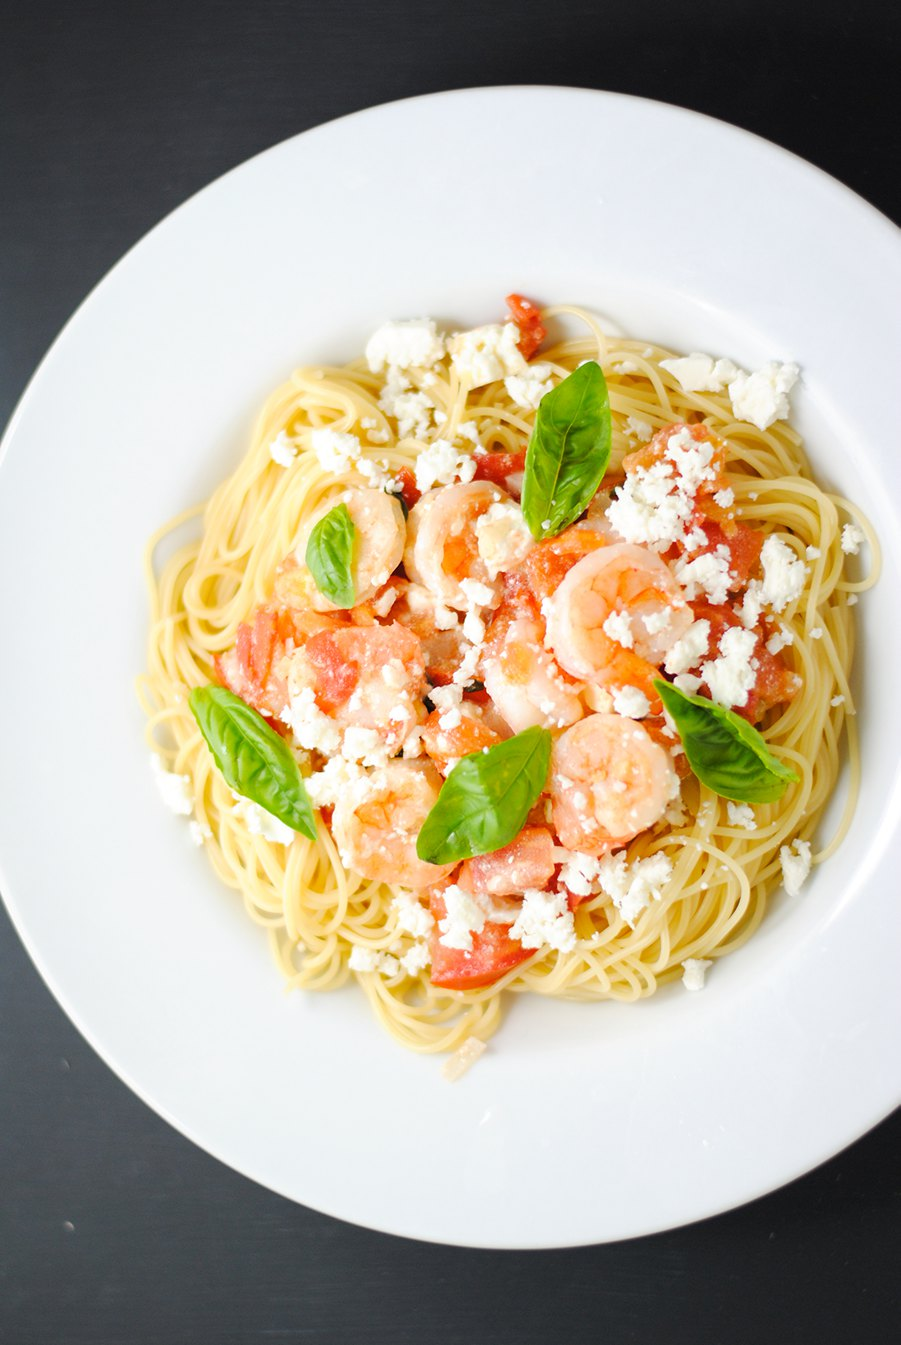 Shrimp with pasta and feta